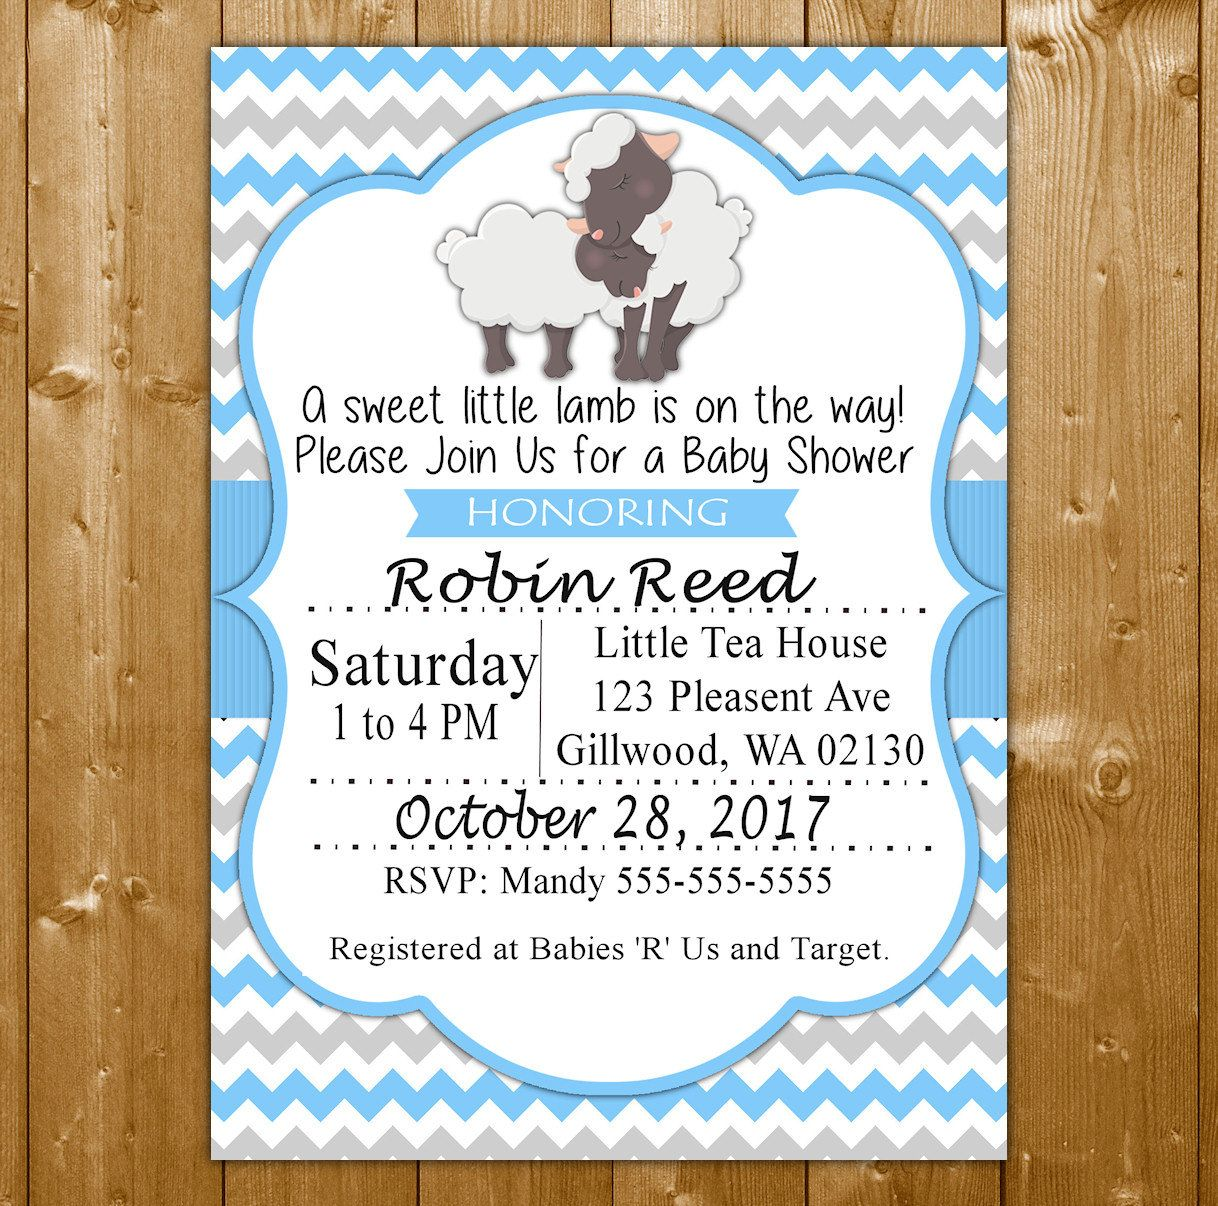 Lamb Baby Shower Invitation - Baby Shower Invitation for a Boy ...